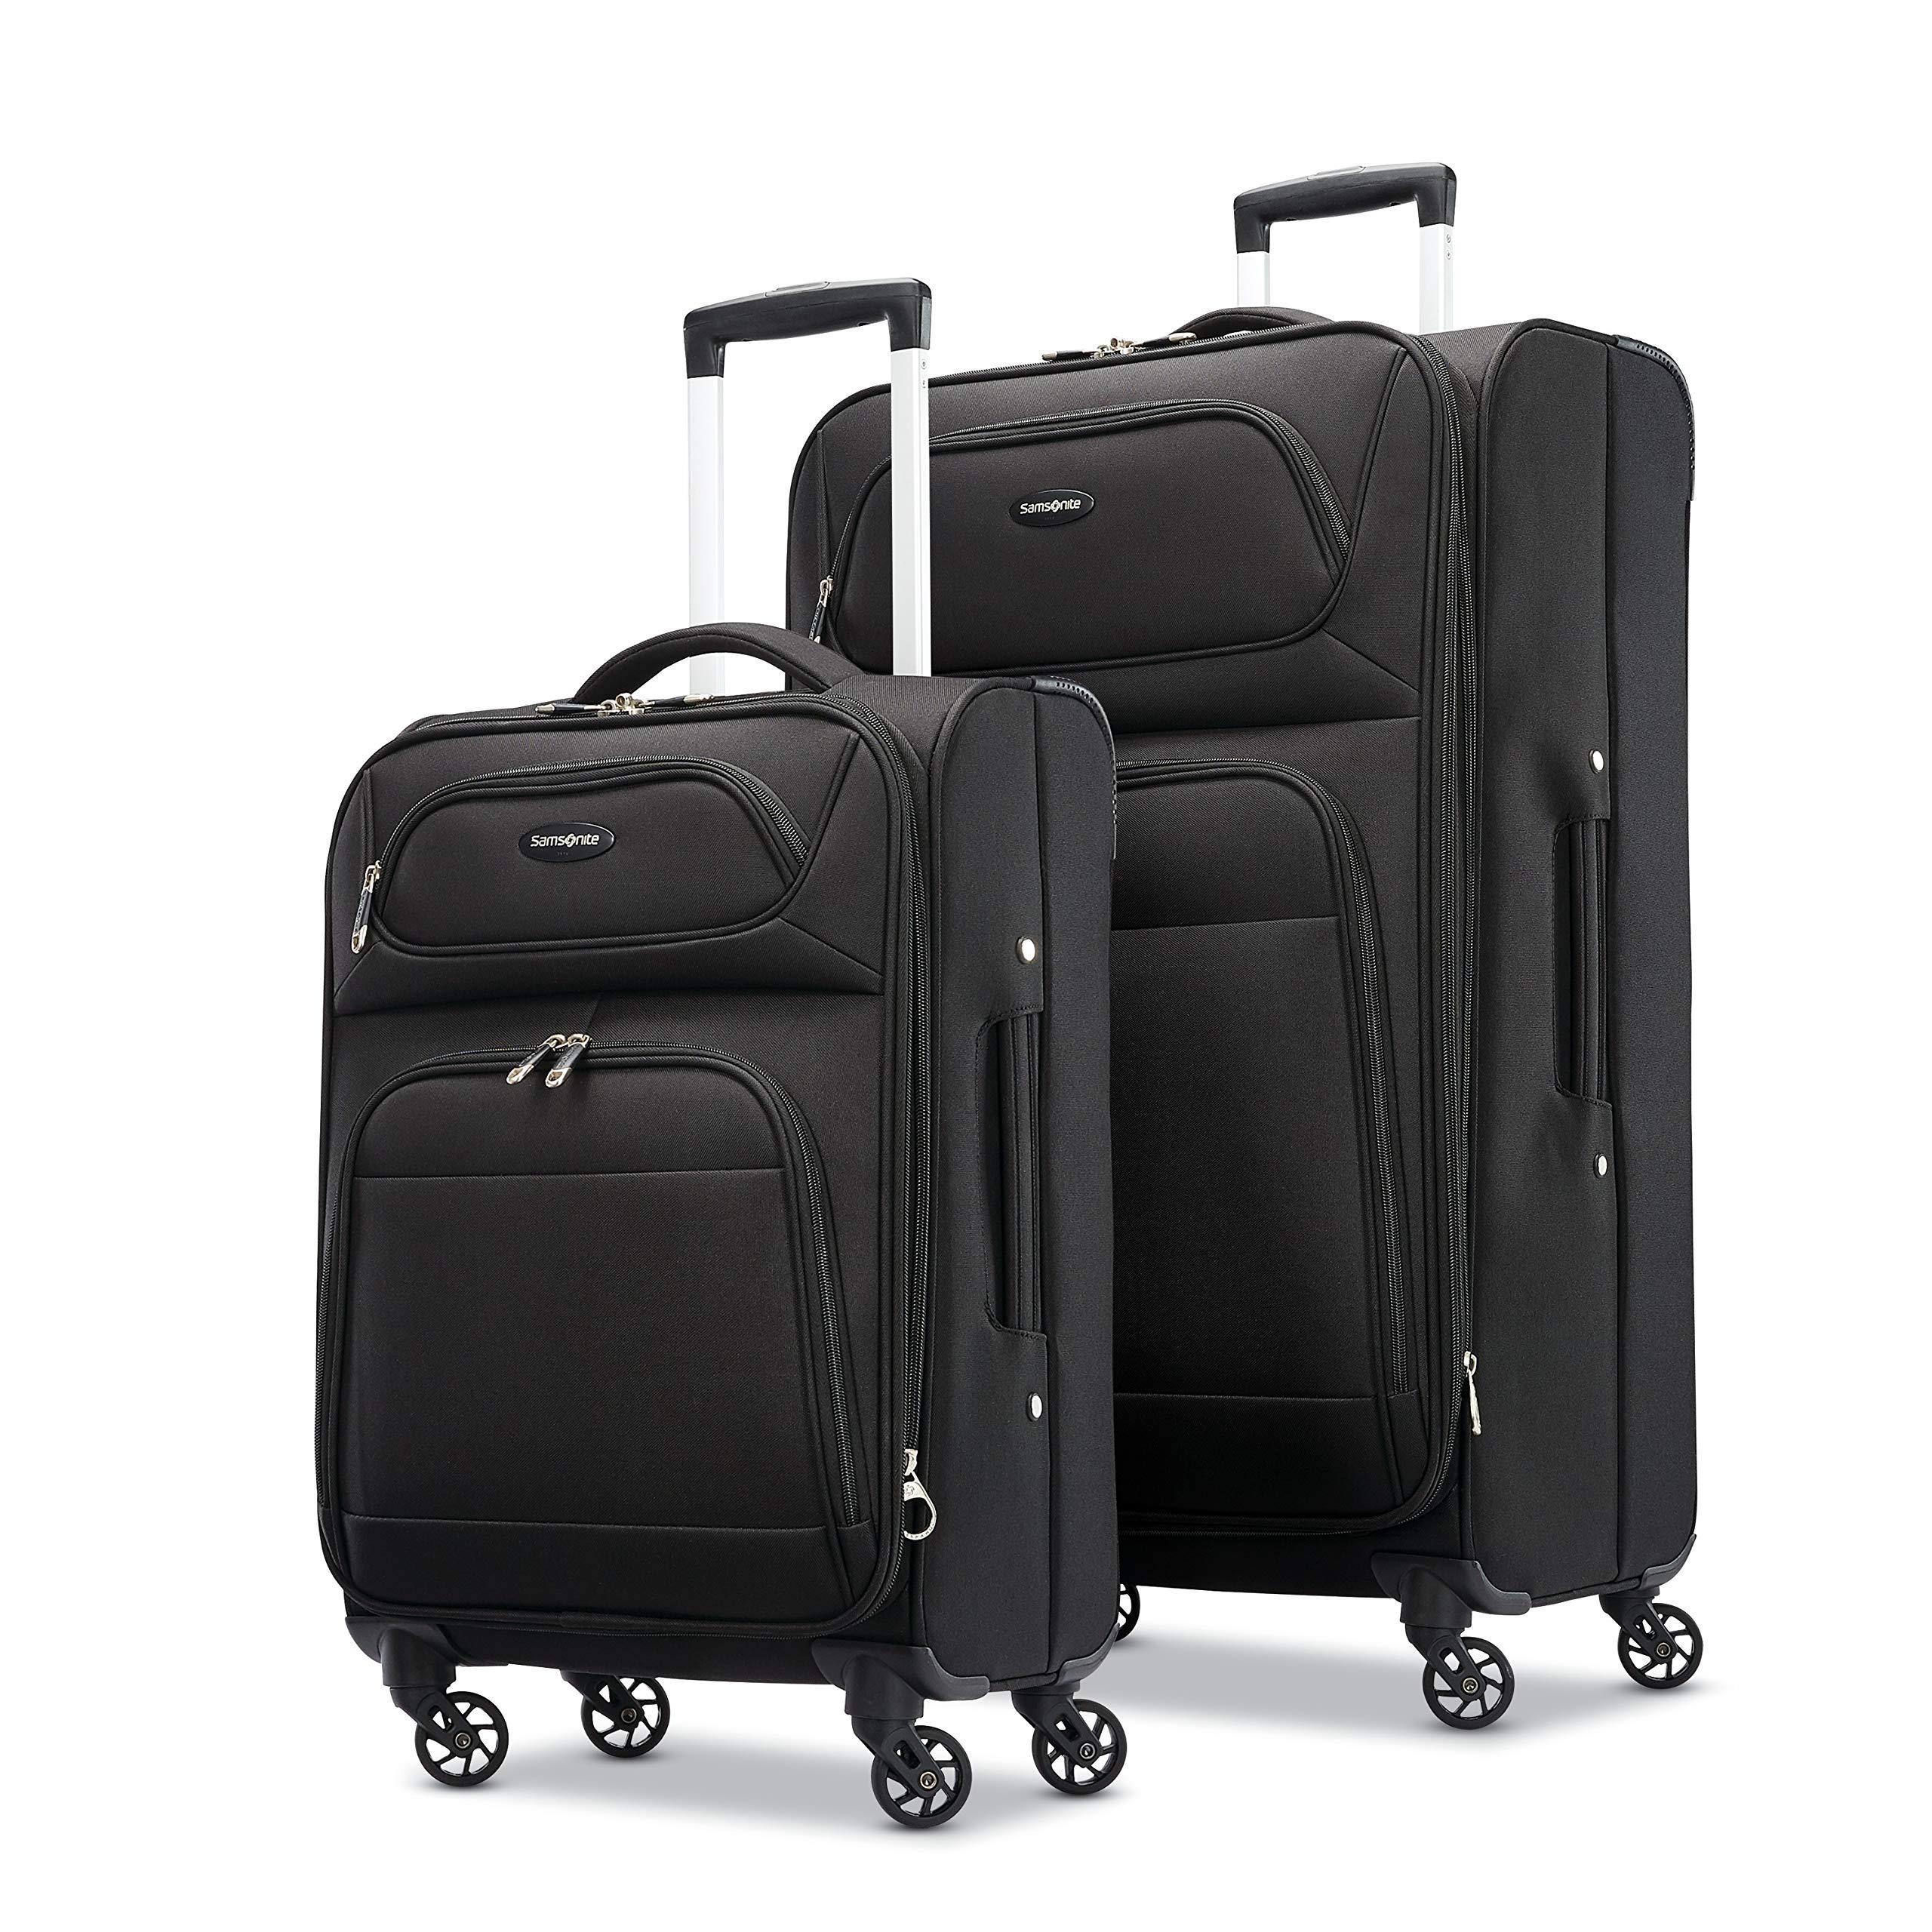 Samsonite Transyt Expandable Softside Luggage Set with Spinner Wheels, 2-Piece (20''/28''), Black